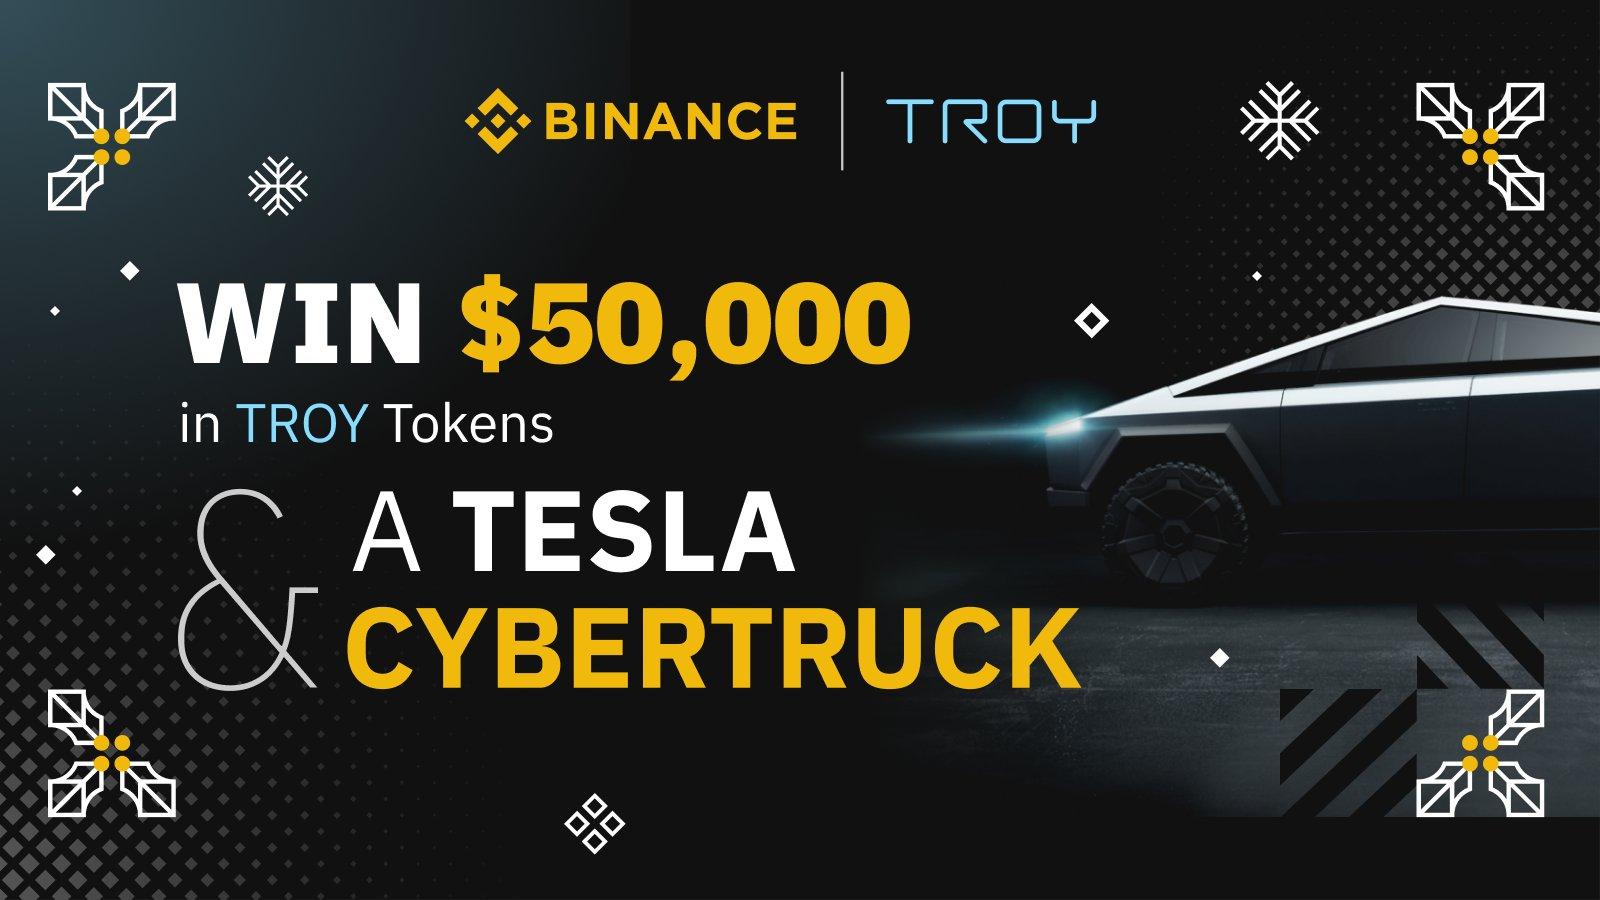 Un Cybertruck Tesla à gagner pour noël sur Binance